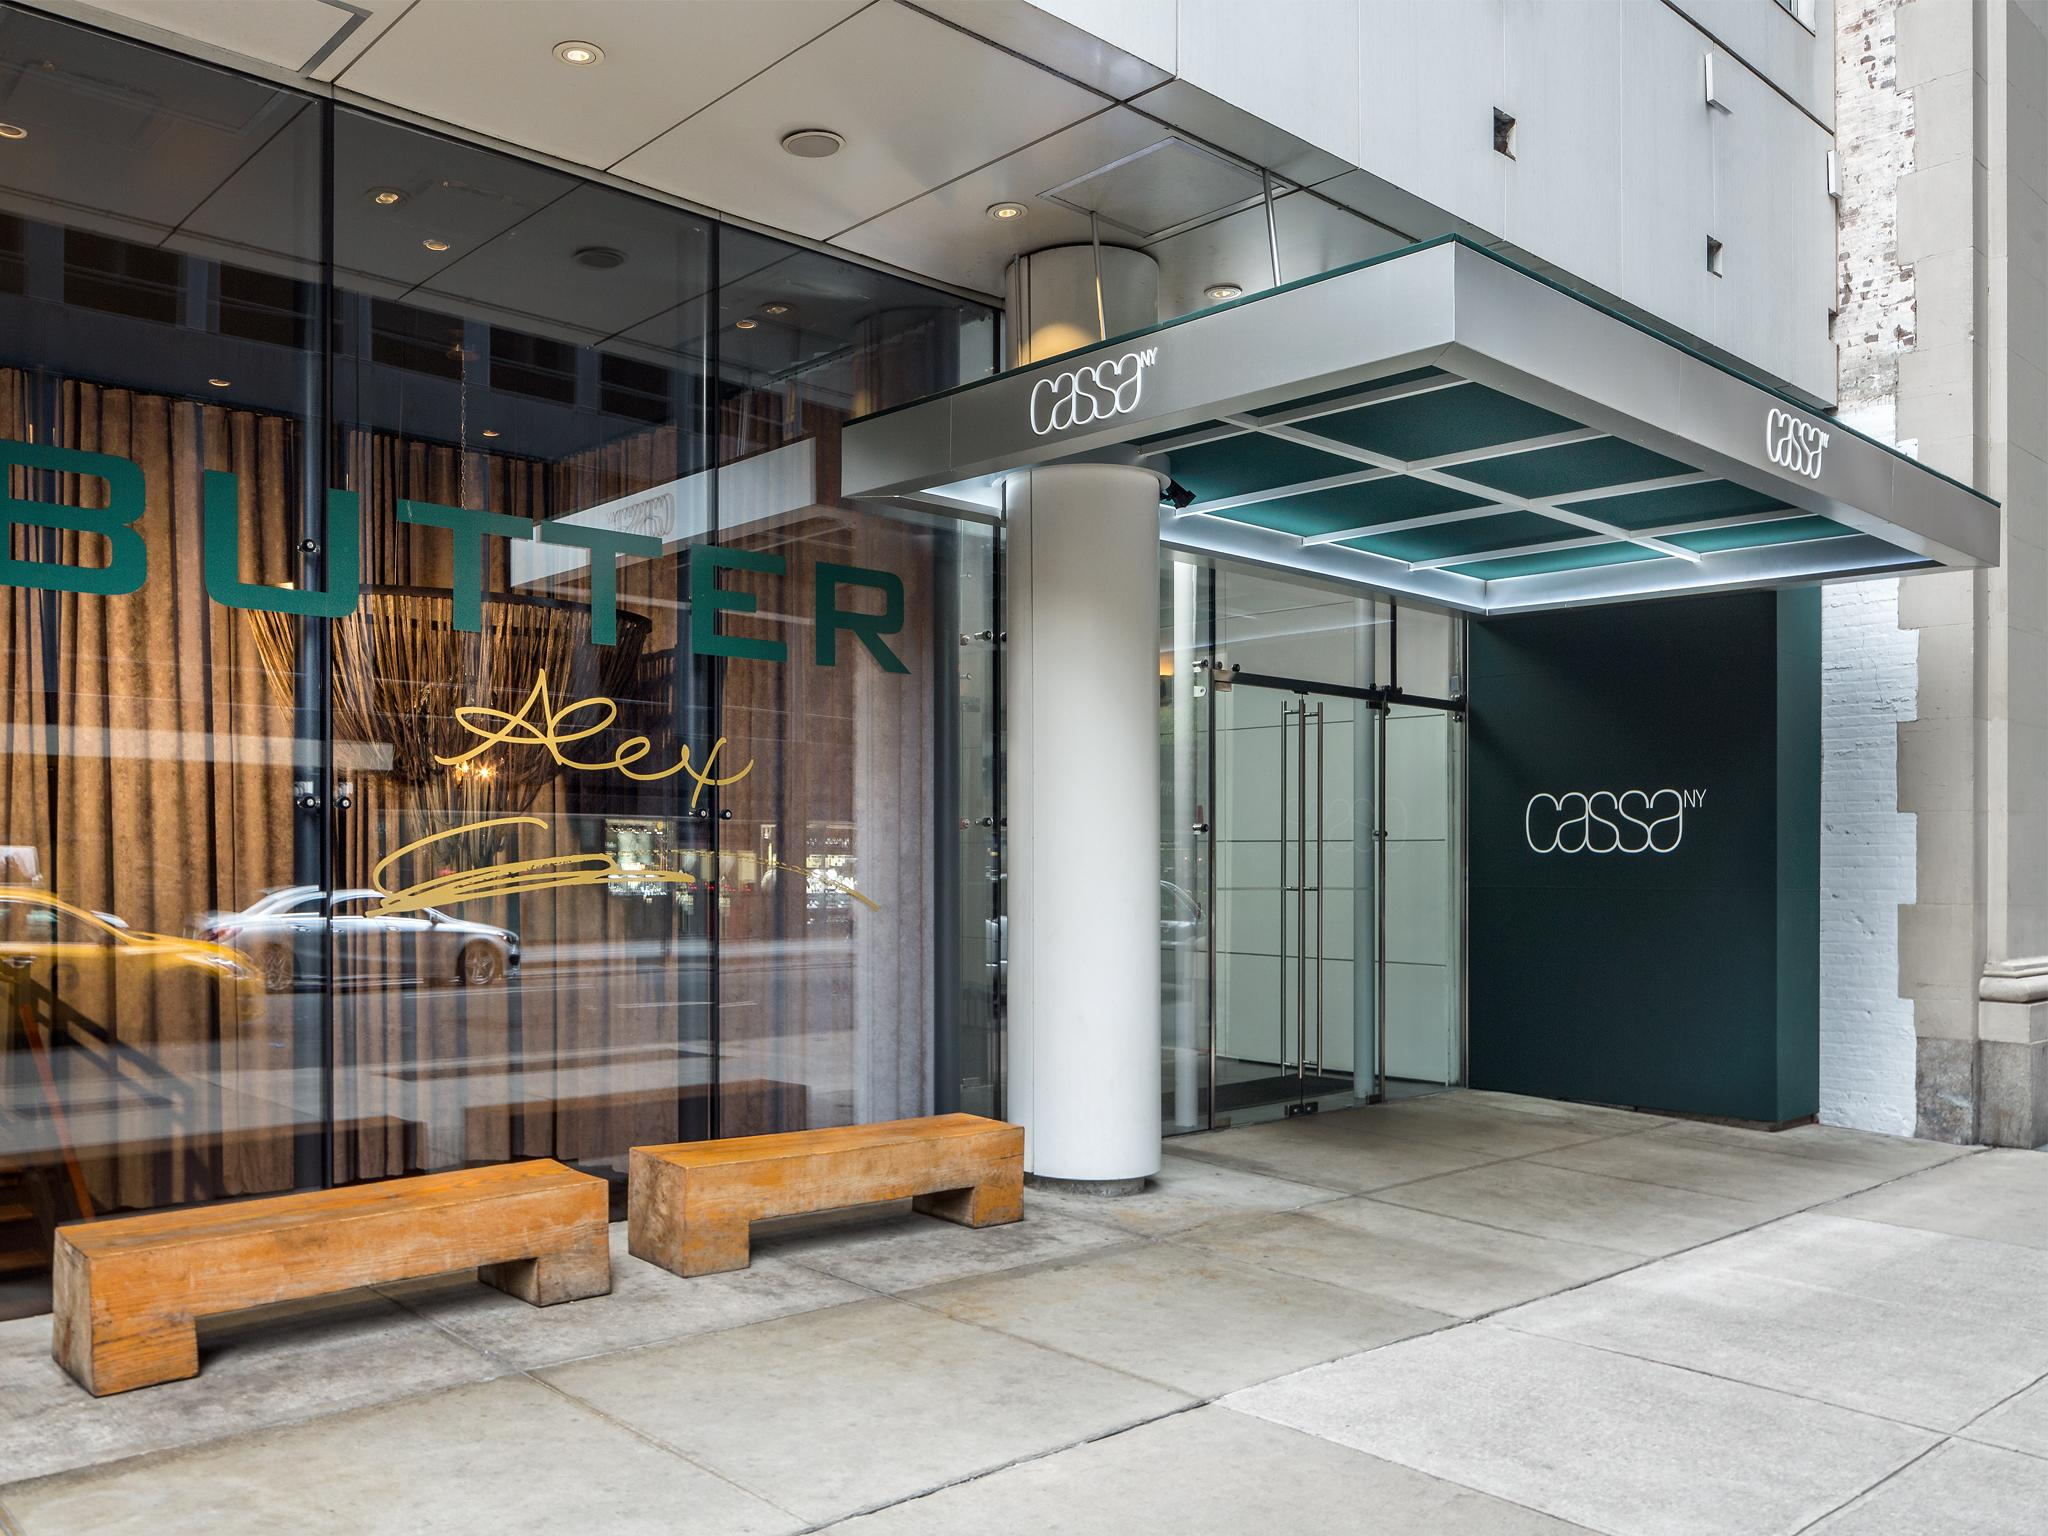 cassa hotel 45th street new york in new york ny room deals rh agoda com cassa hotel 45th street cassa hotel 45th street new york 4 star